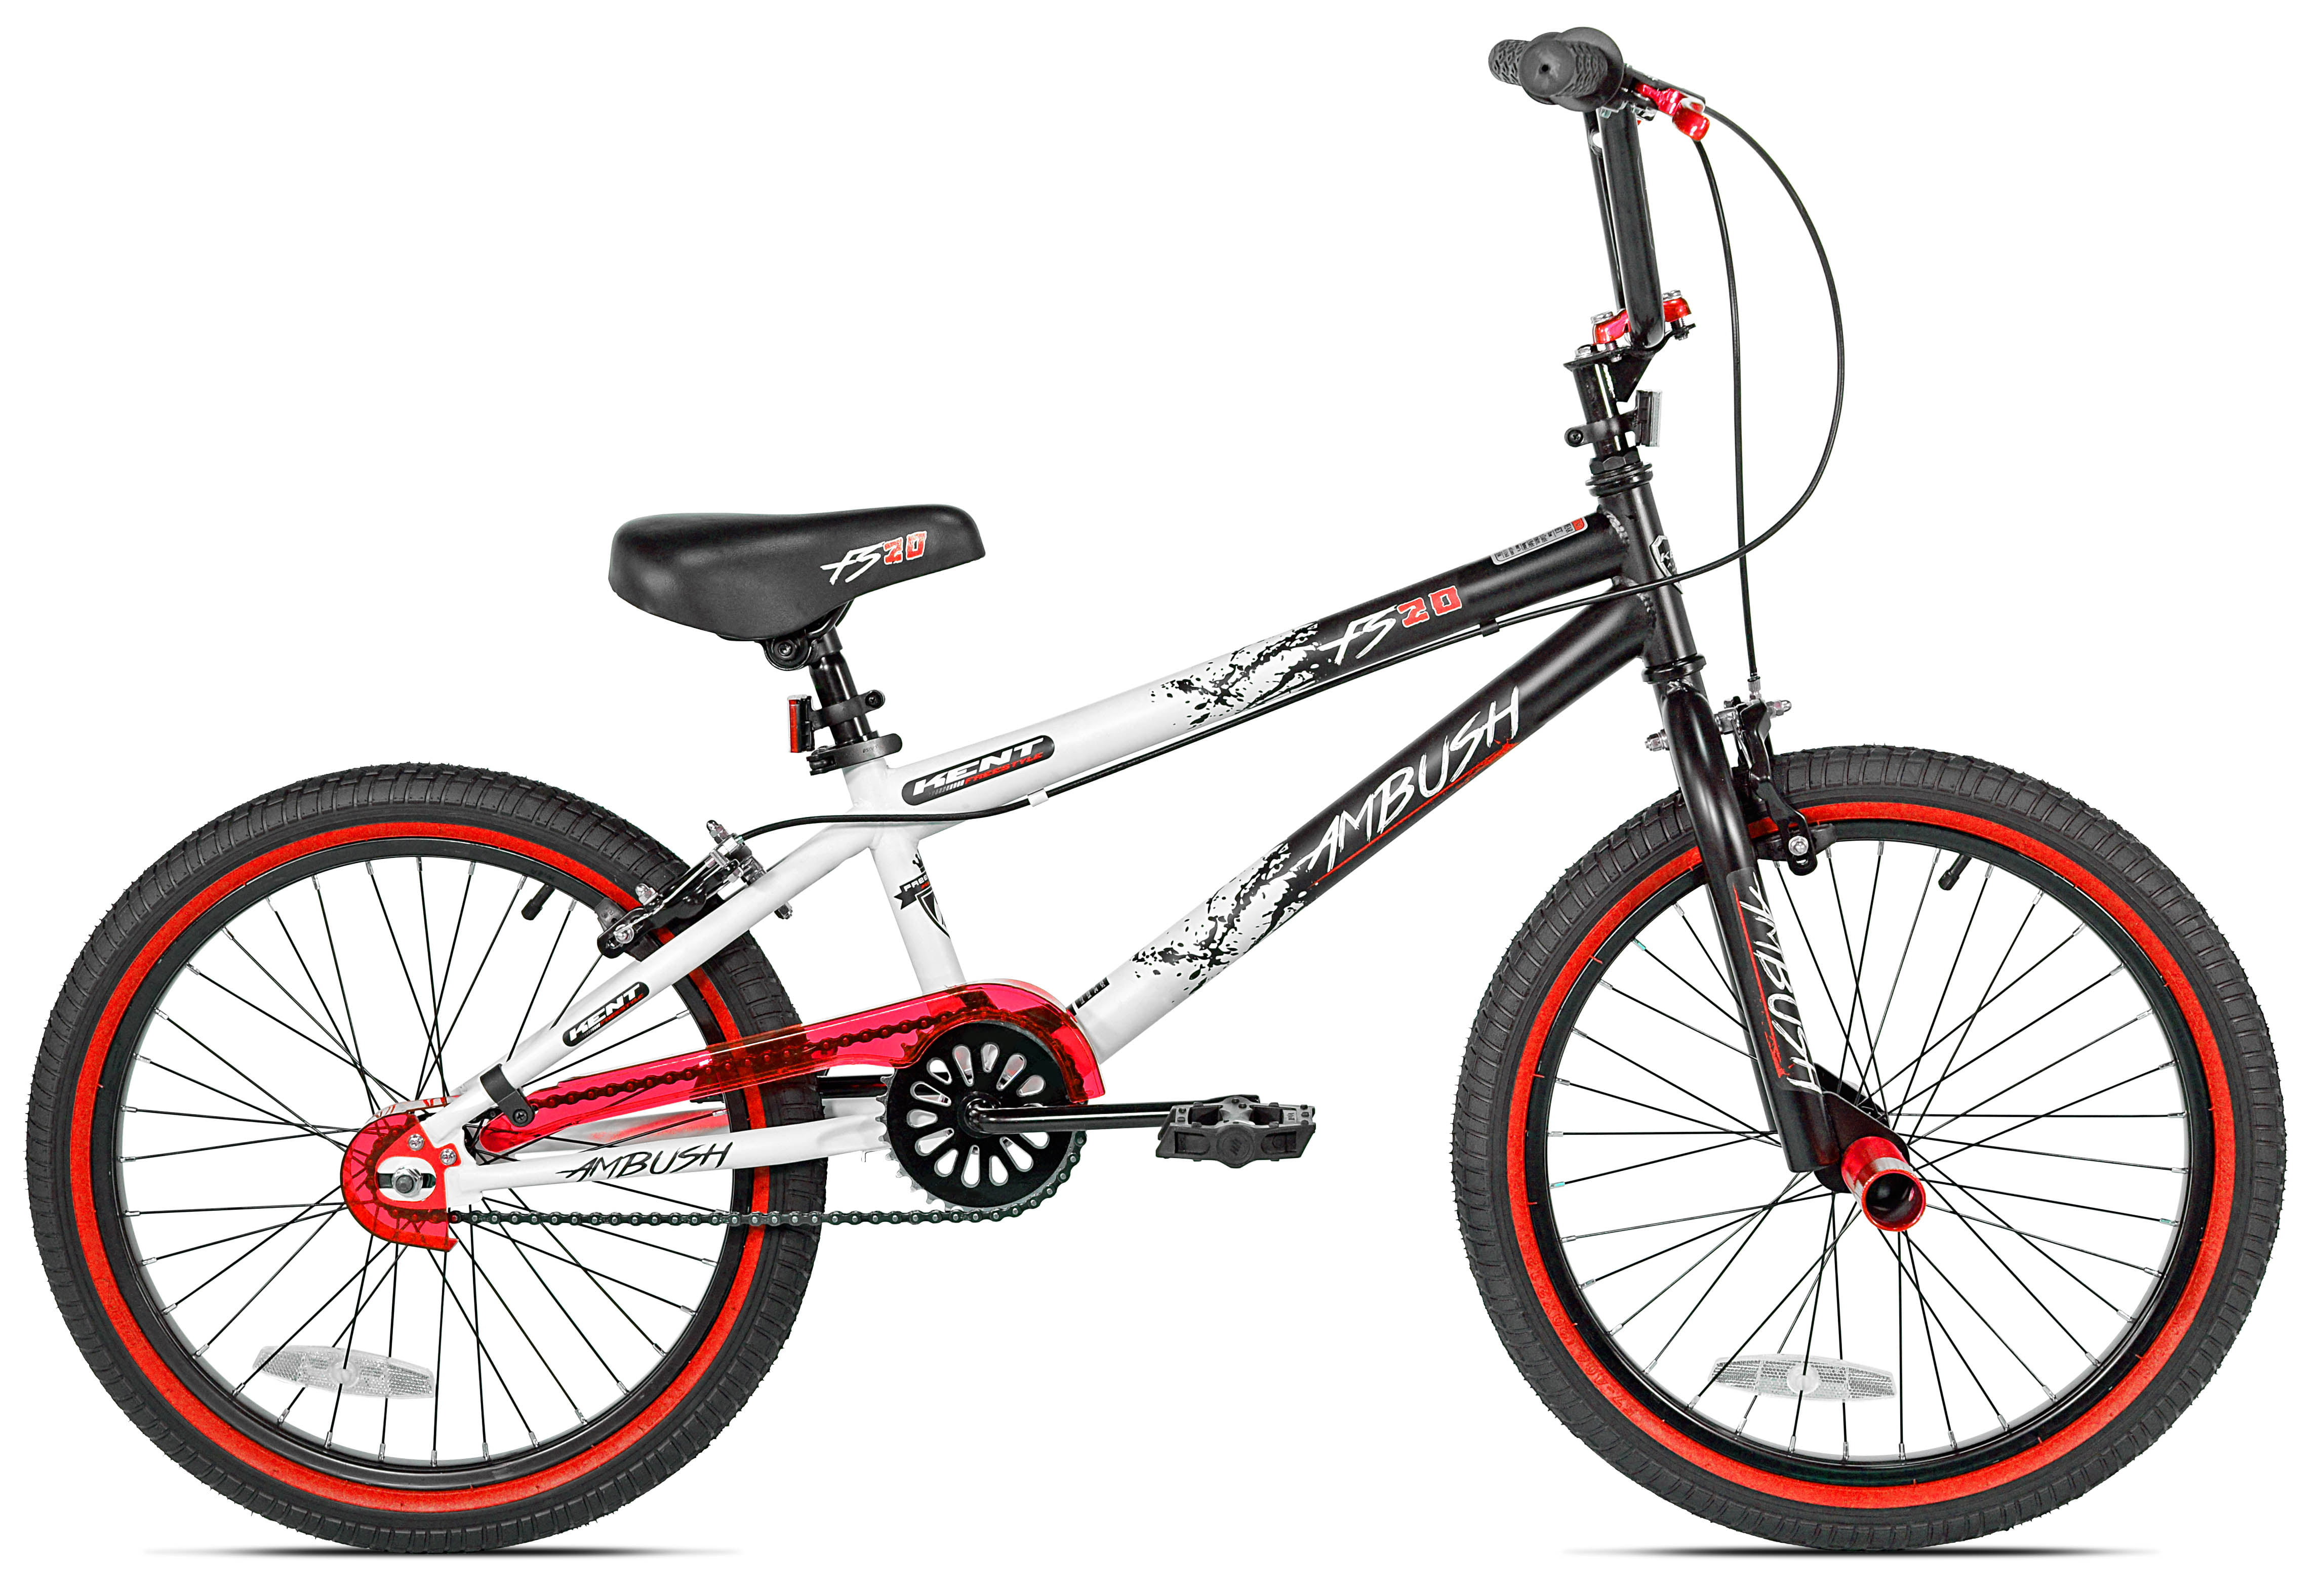 "Kent 20"" Boys', Ambush BMX Bike, Black/Red, For Ages 8-12"